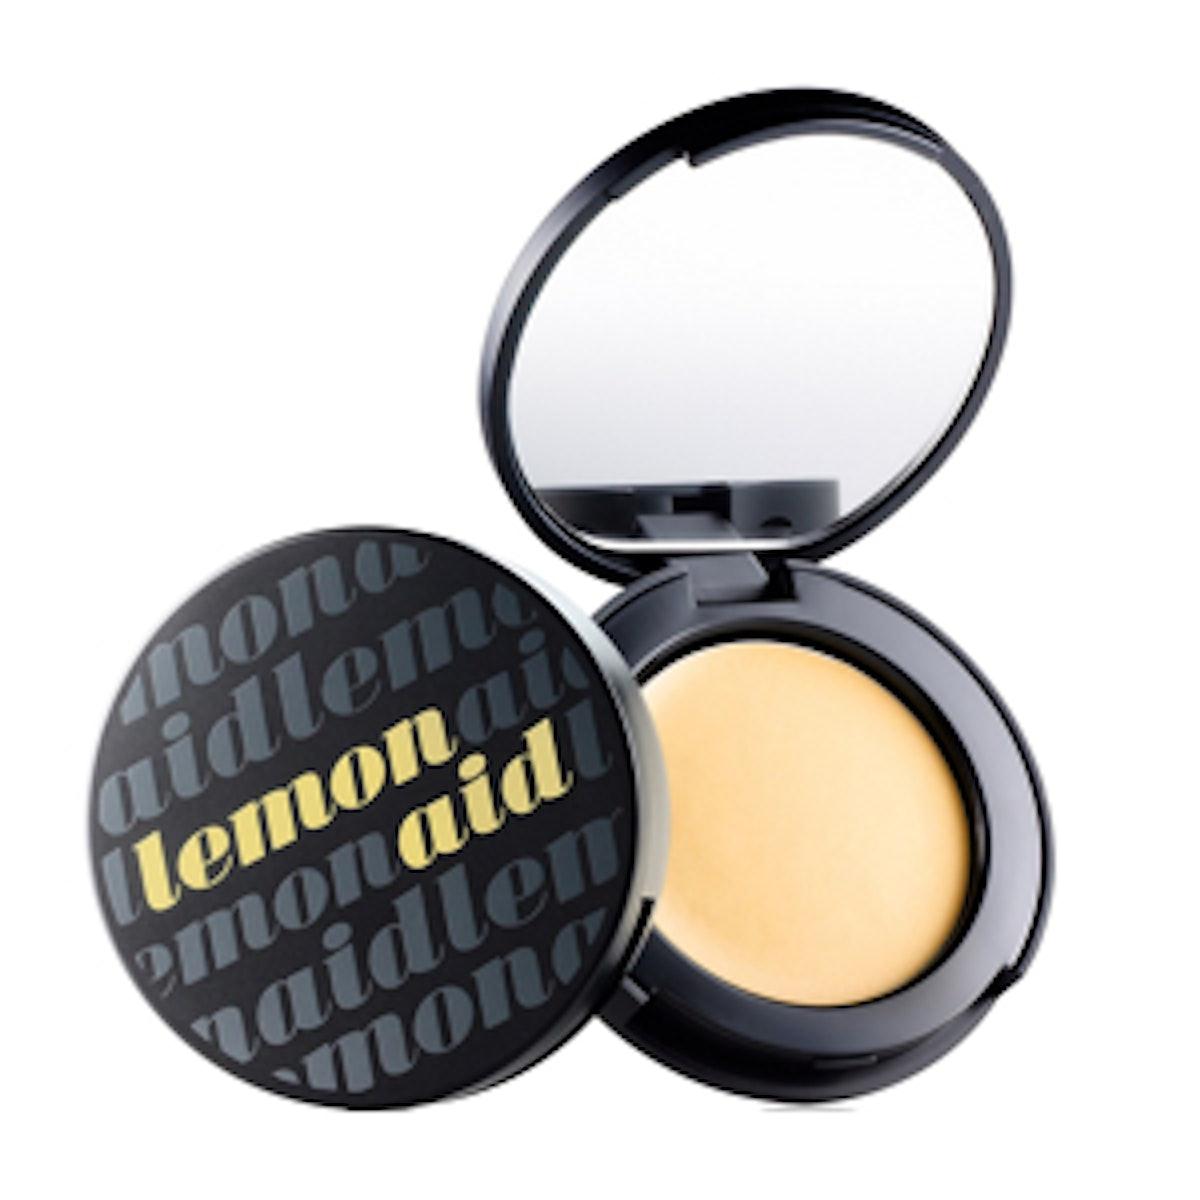 Benefit Lemon Aid Color Correcting Eyelid Primer